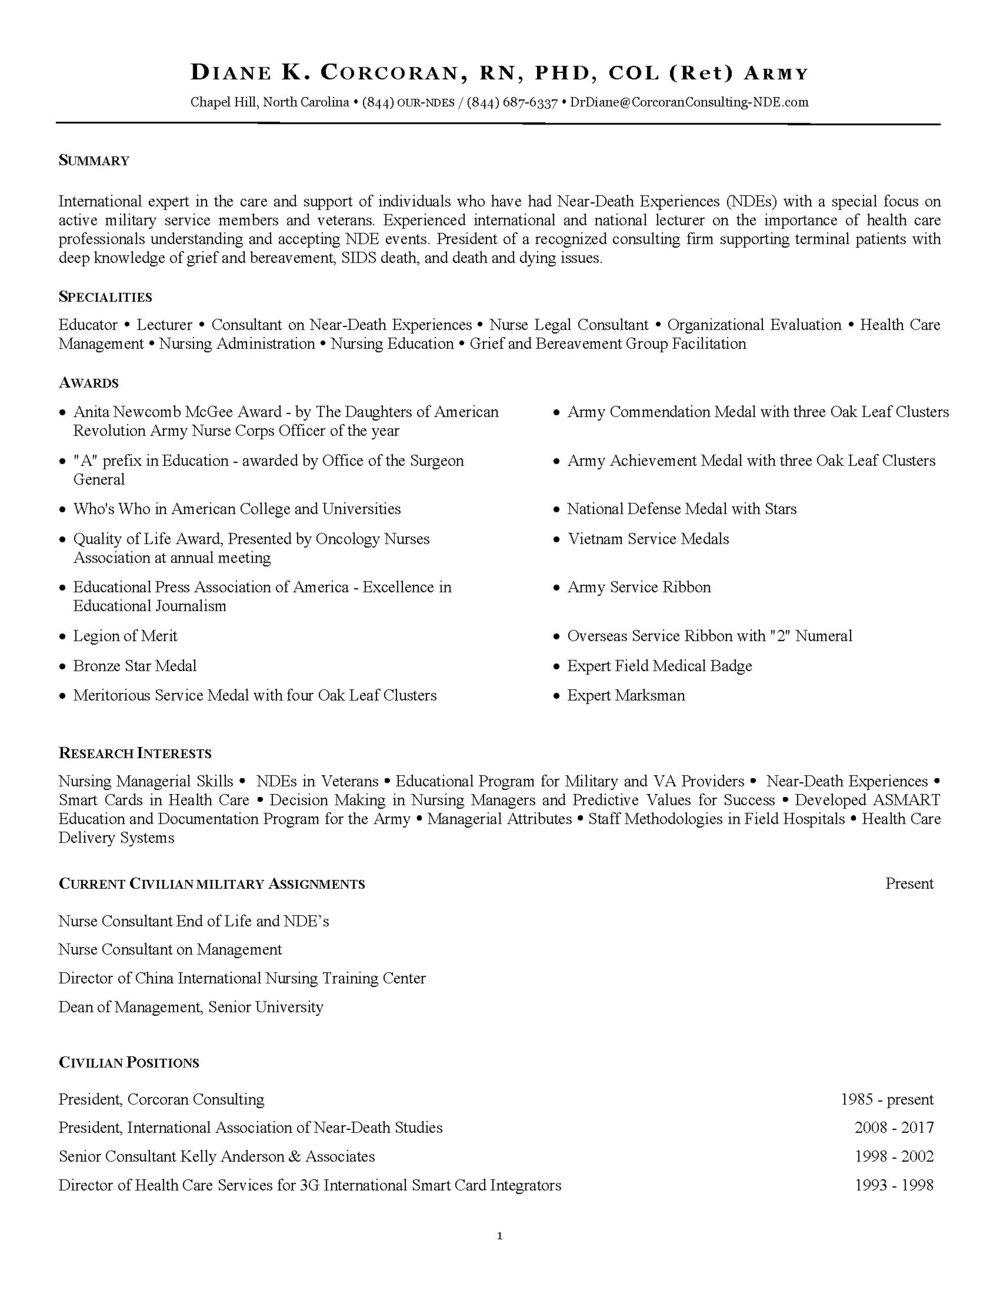 Diane Corcoran Resume V2a_Page_01.jpg